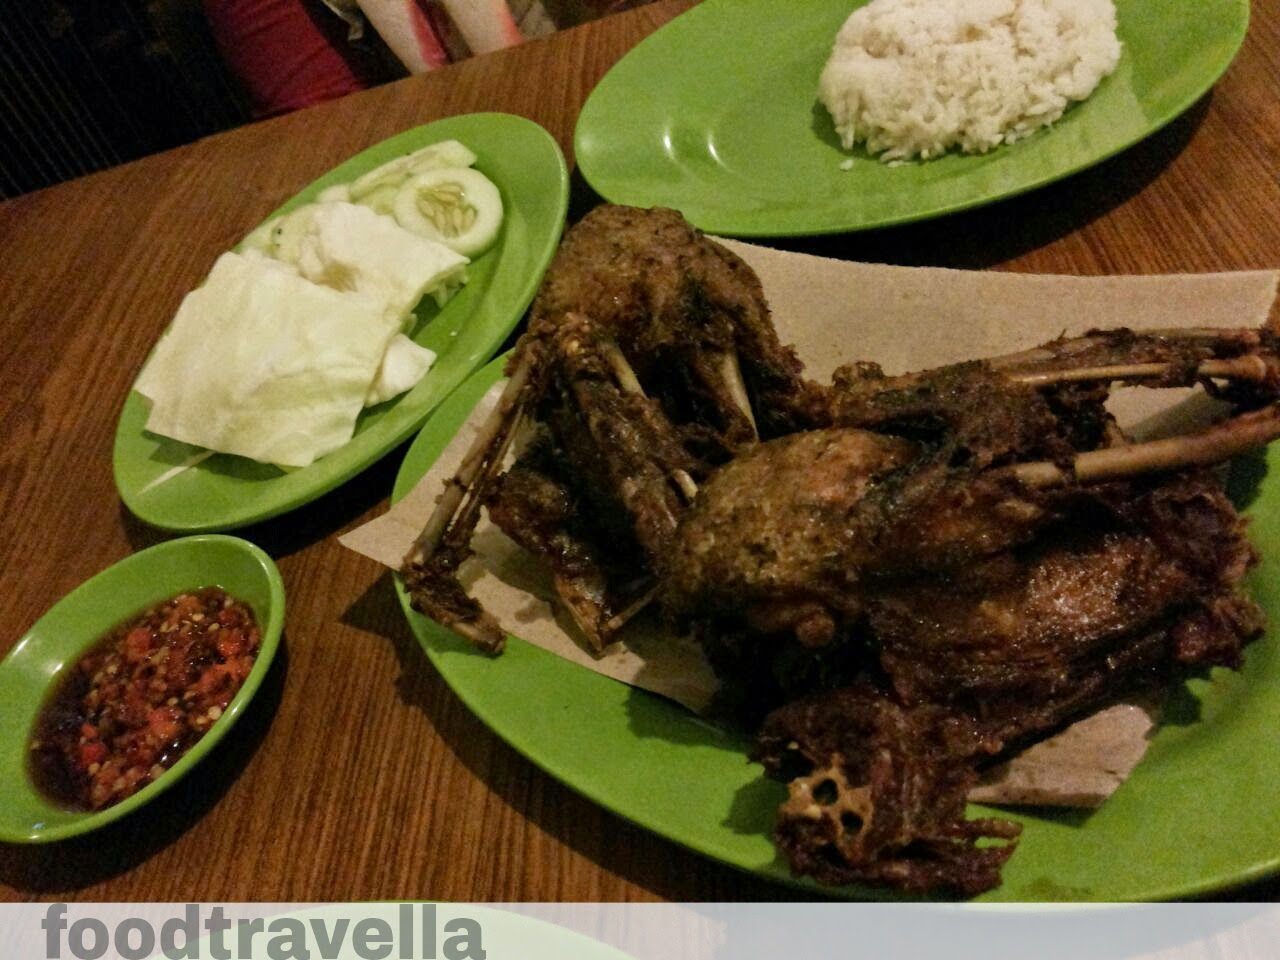 Food Traveller Bebek Goreng H Slamet Cab Kartosuro Jl Bali